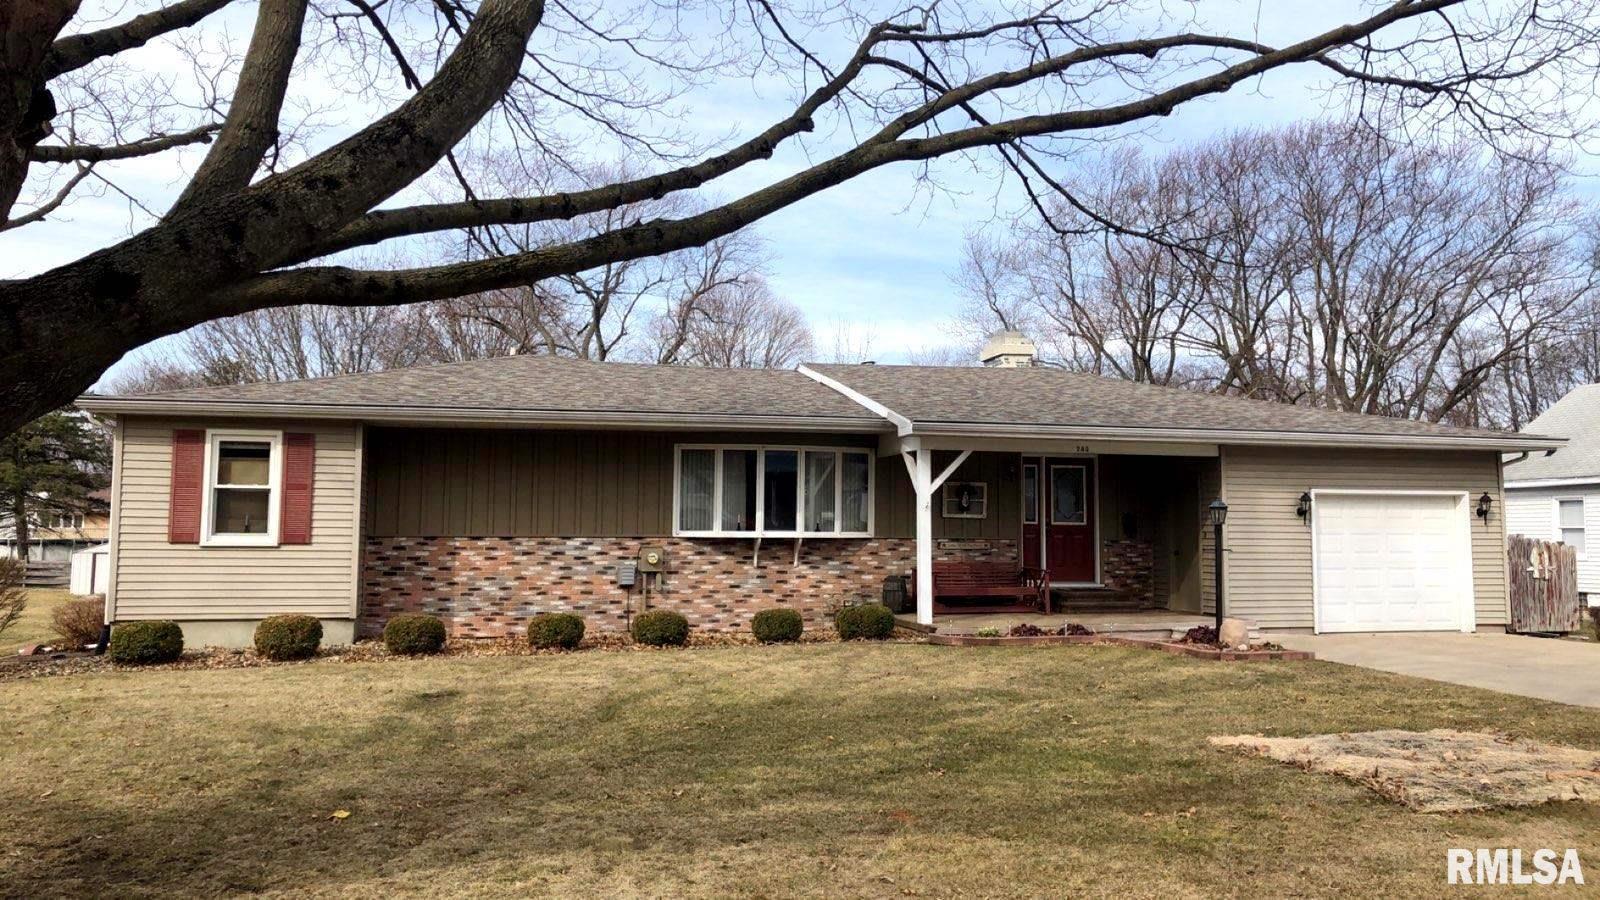 280 N 2ND Property Photo - Farmington, IL real estate listing